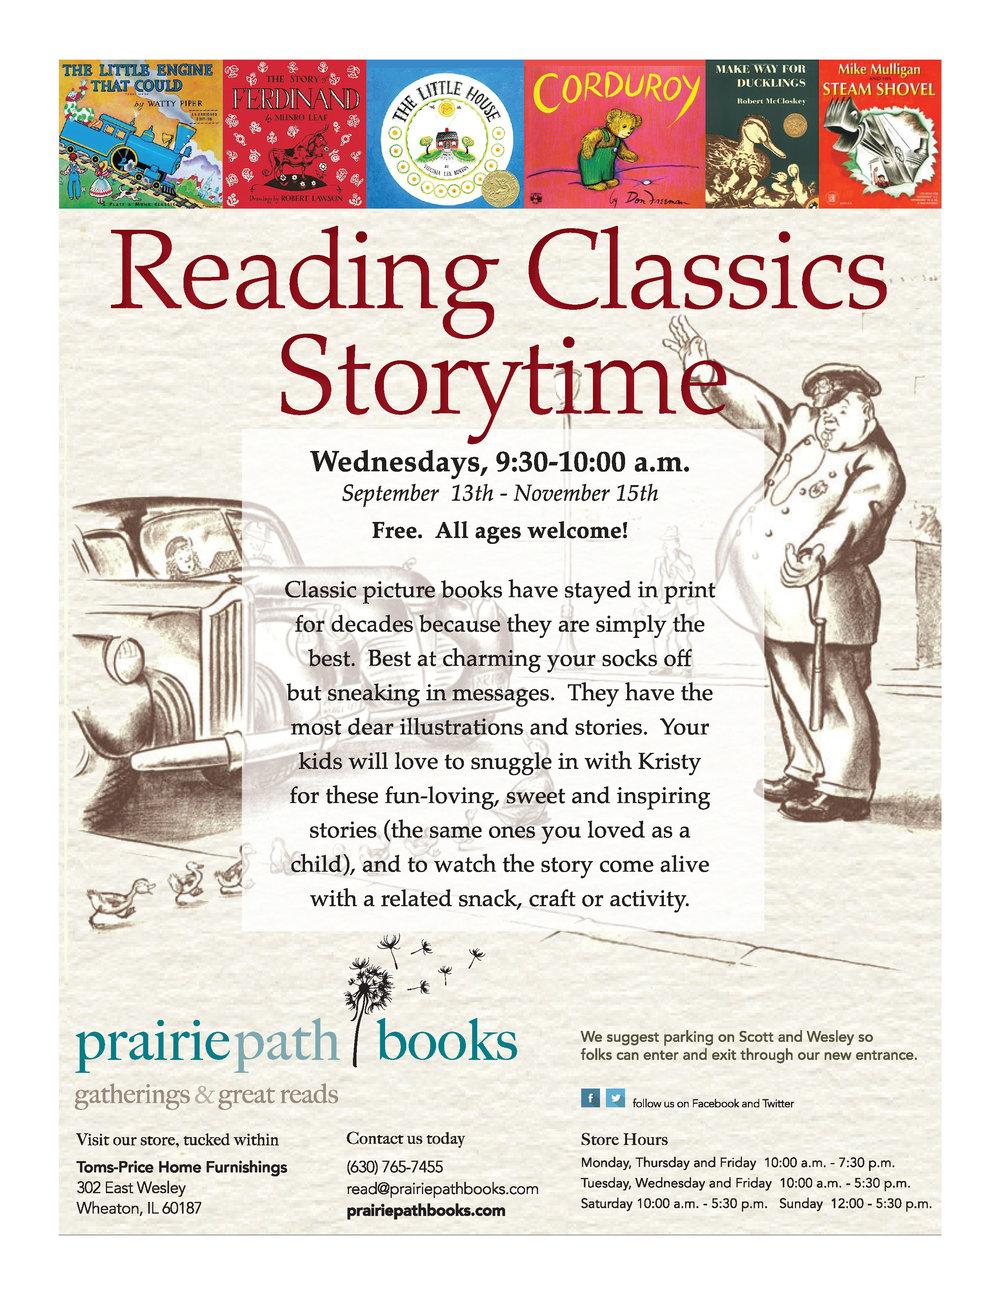 ReadingClassicsStorytime.jpg